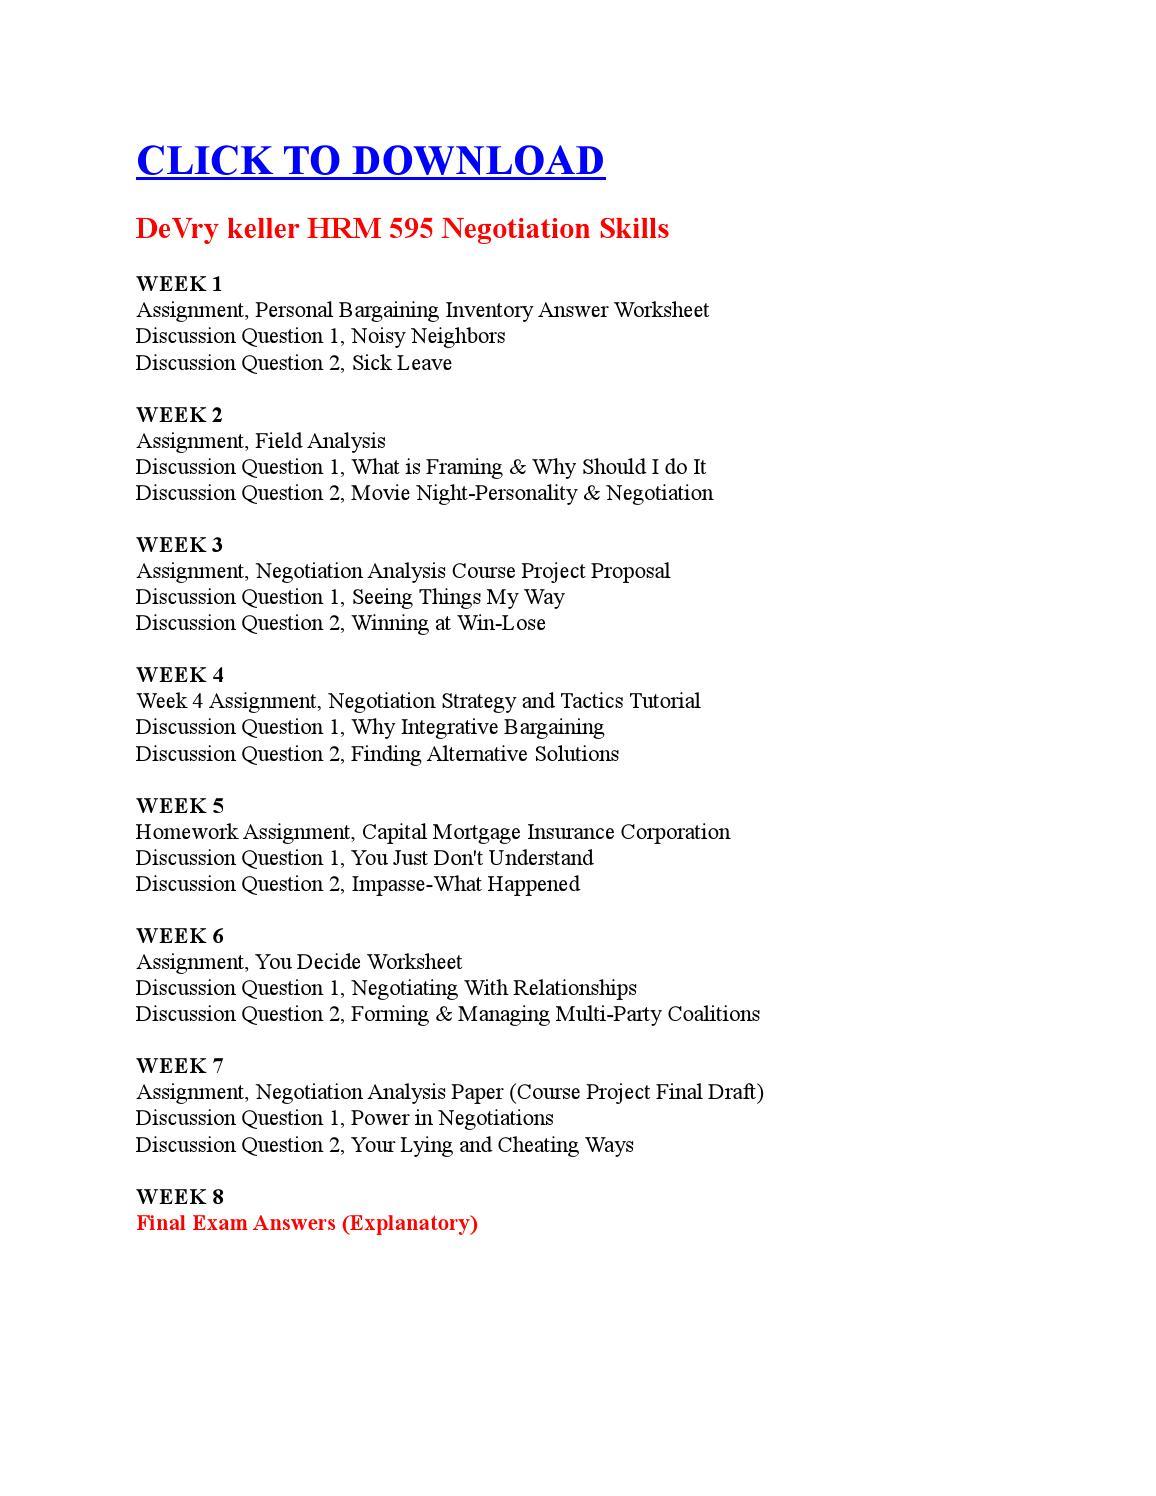 Worksheets Negotiation Worksheet devry keller hrm 595 negotiation skills by oassignmnents issuu